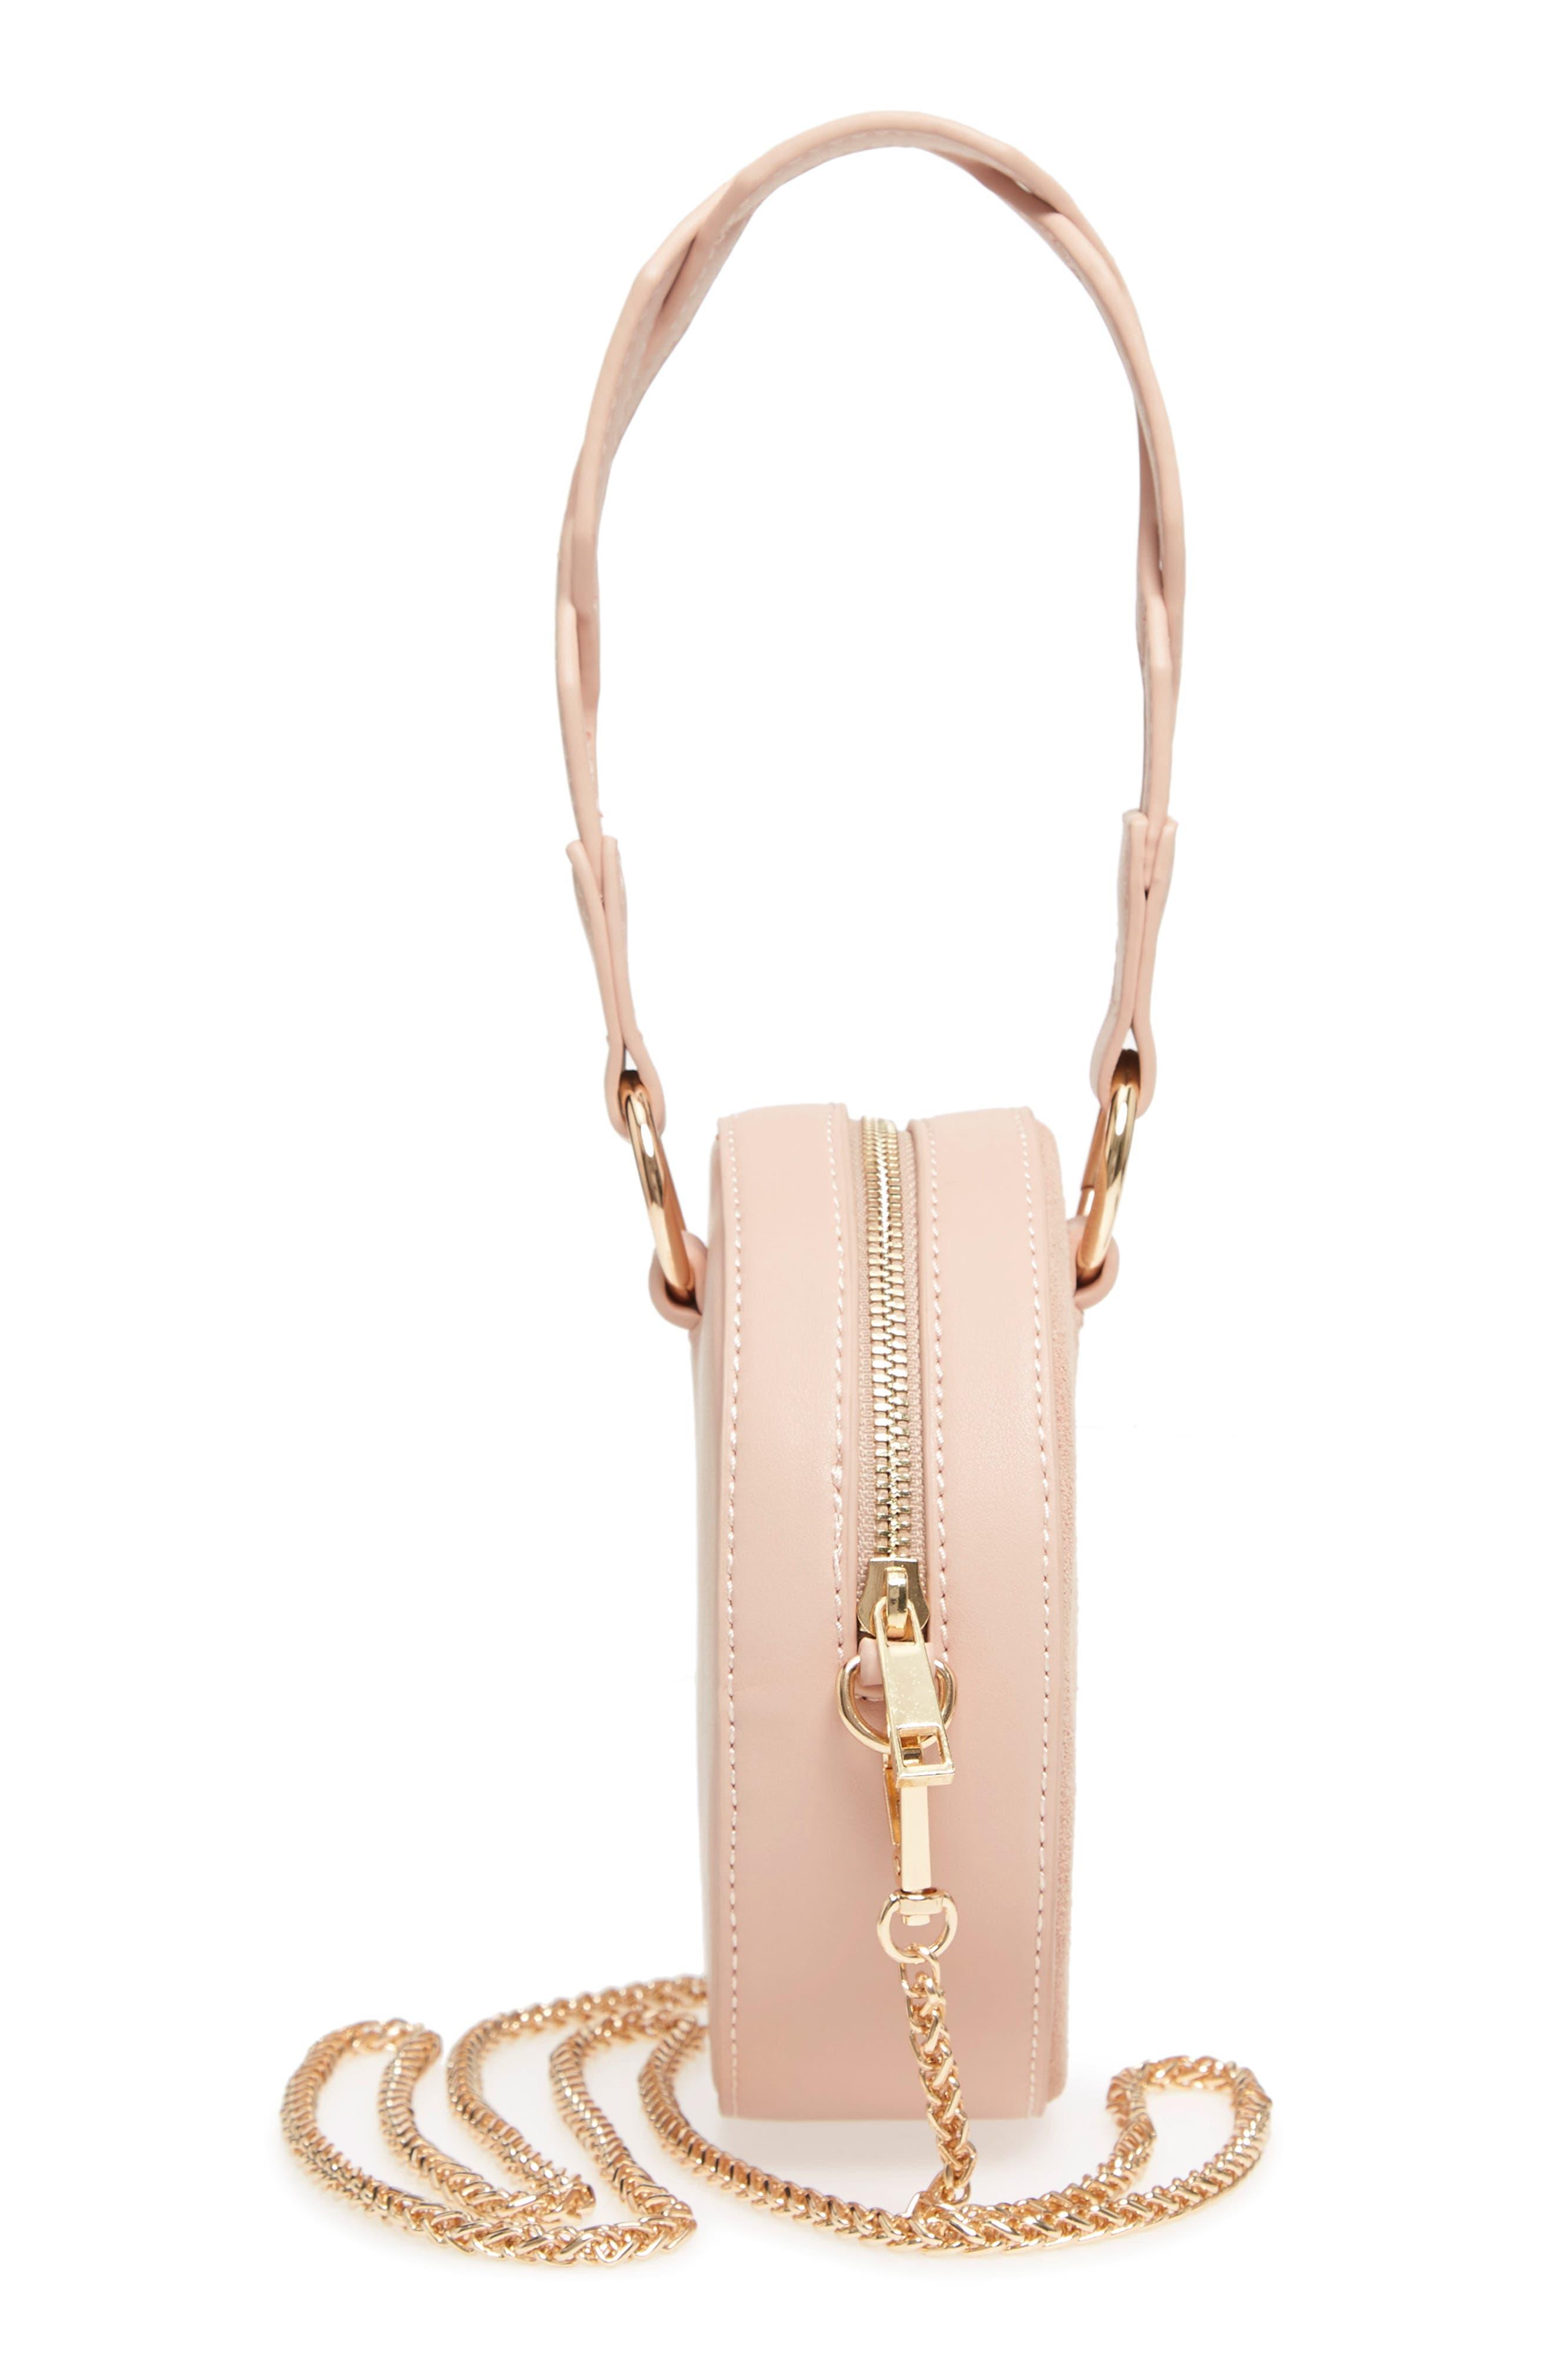 Circle Bag with Wristlet,                             Alternate thumbnail 5, color,                             Tan